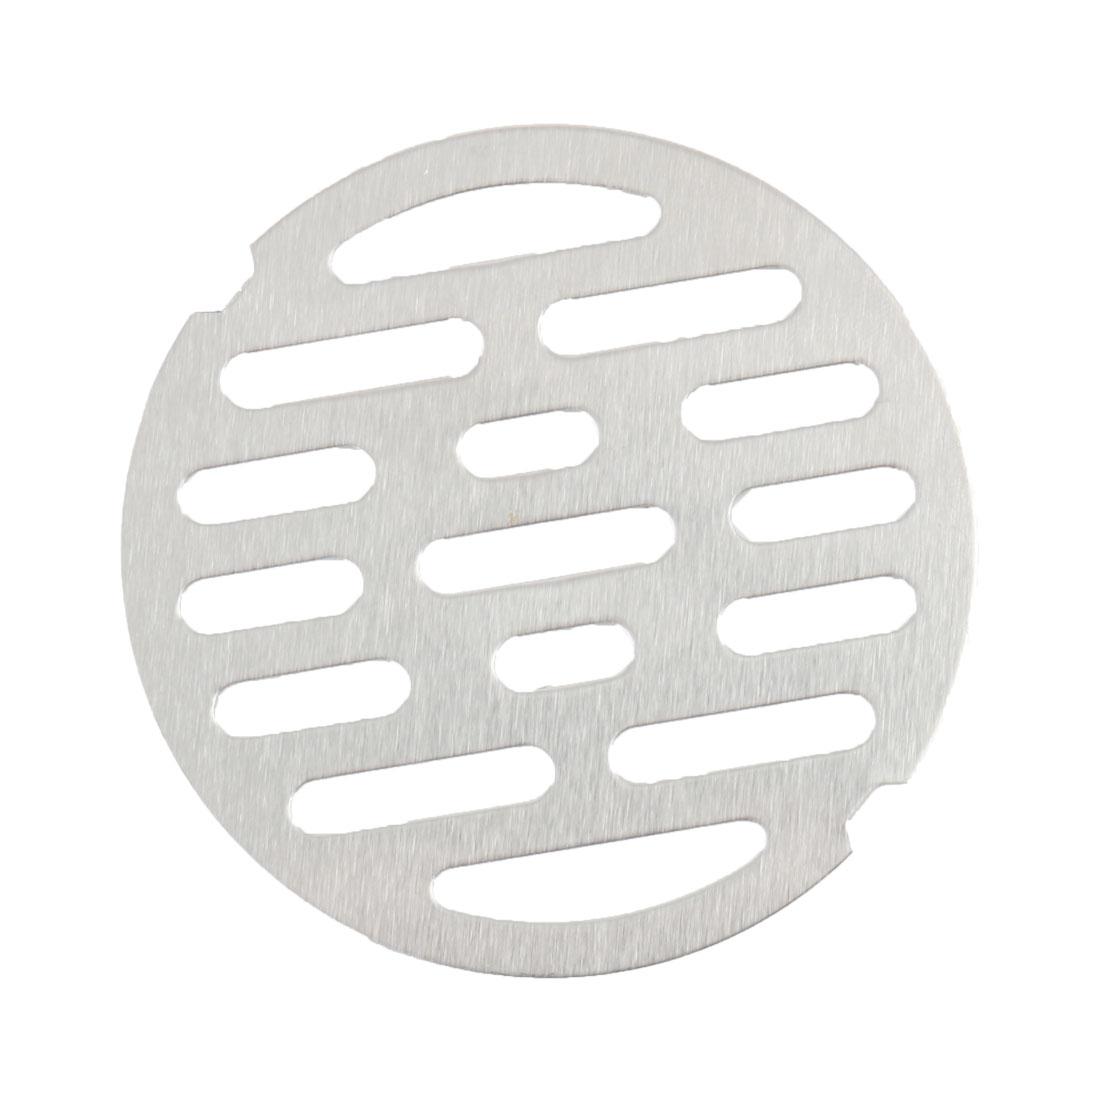 2.9 Inch Snap-in Floor Drain Cover Hair Catcher Sink Drain Strainer Stopper